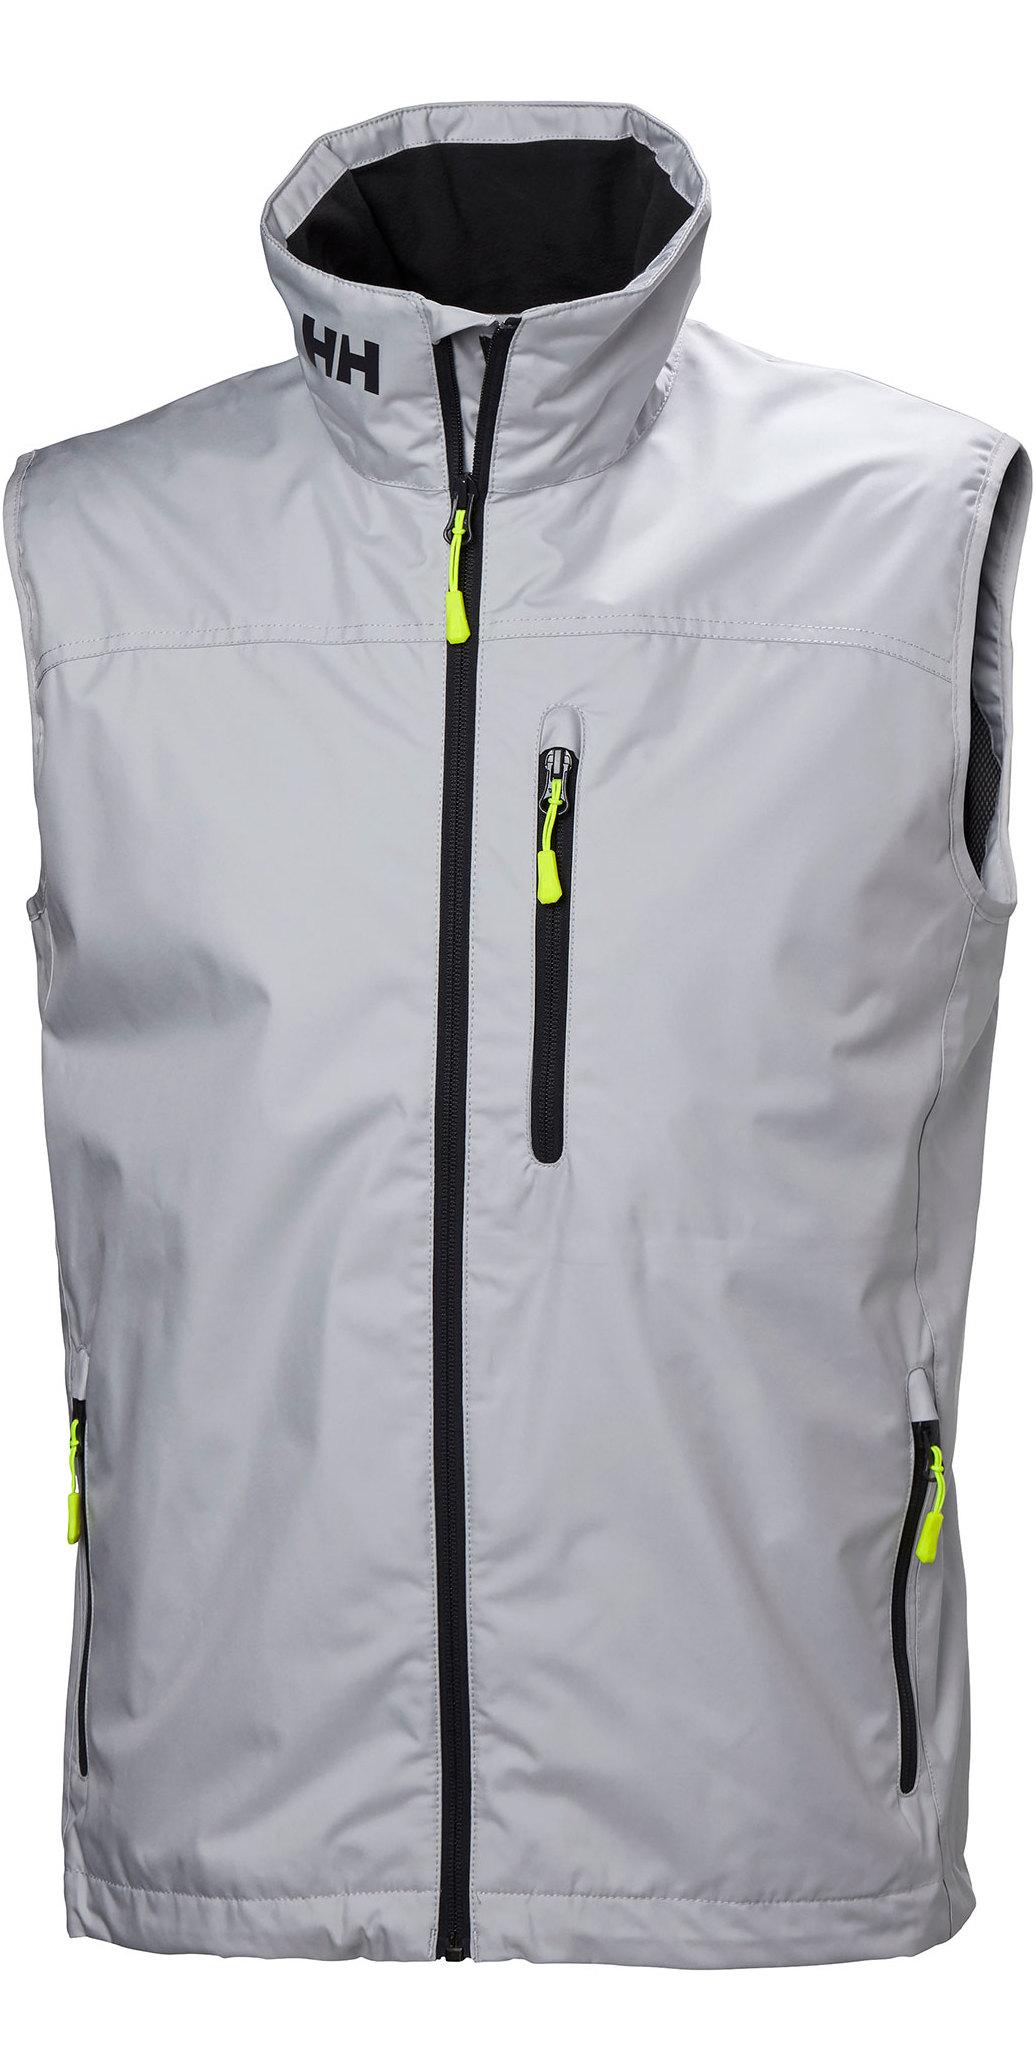 1b09e03b9 2019 Helly Hansen Mens Crew Vest Grey Fog 30270